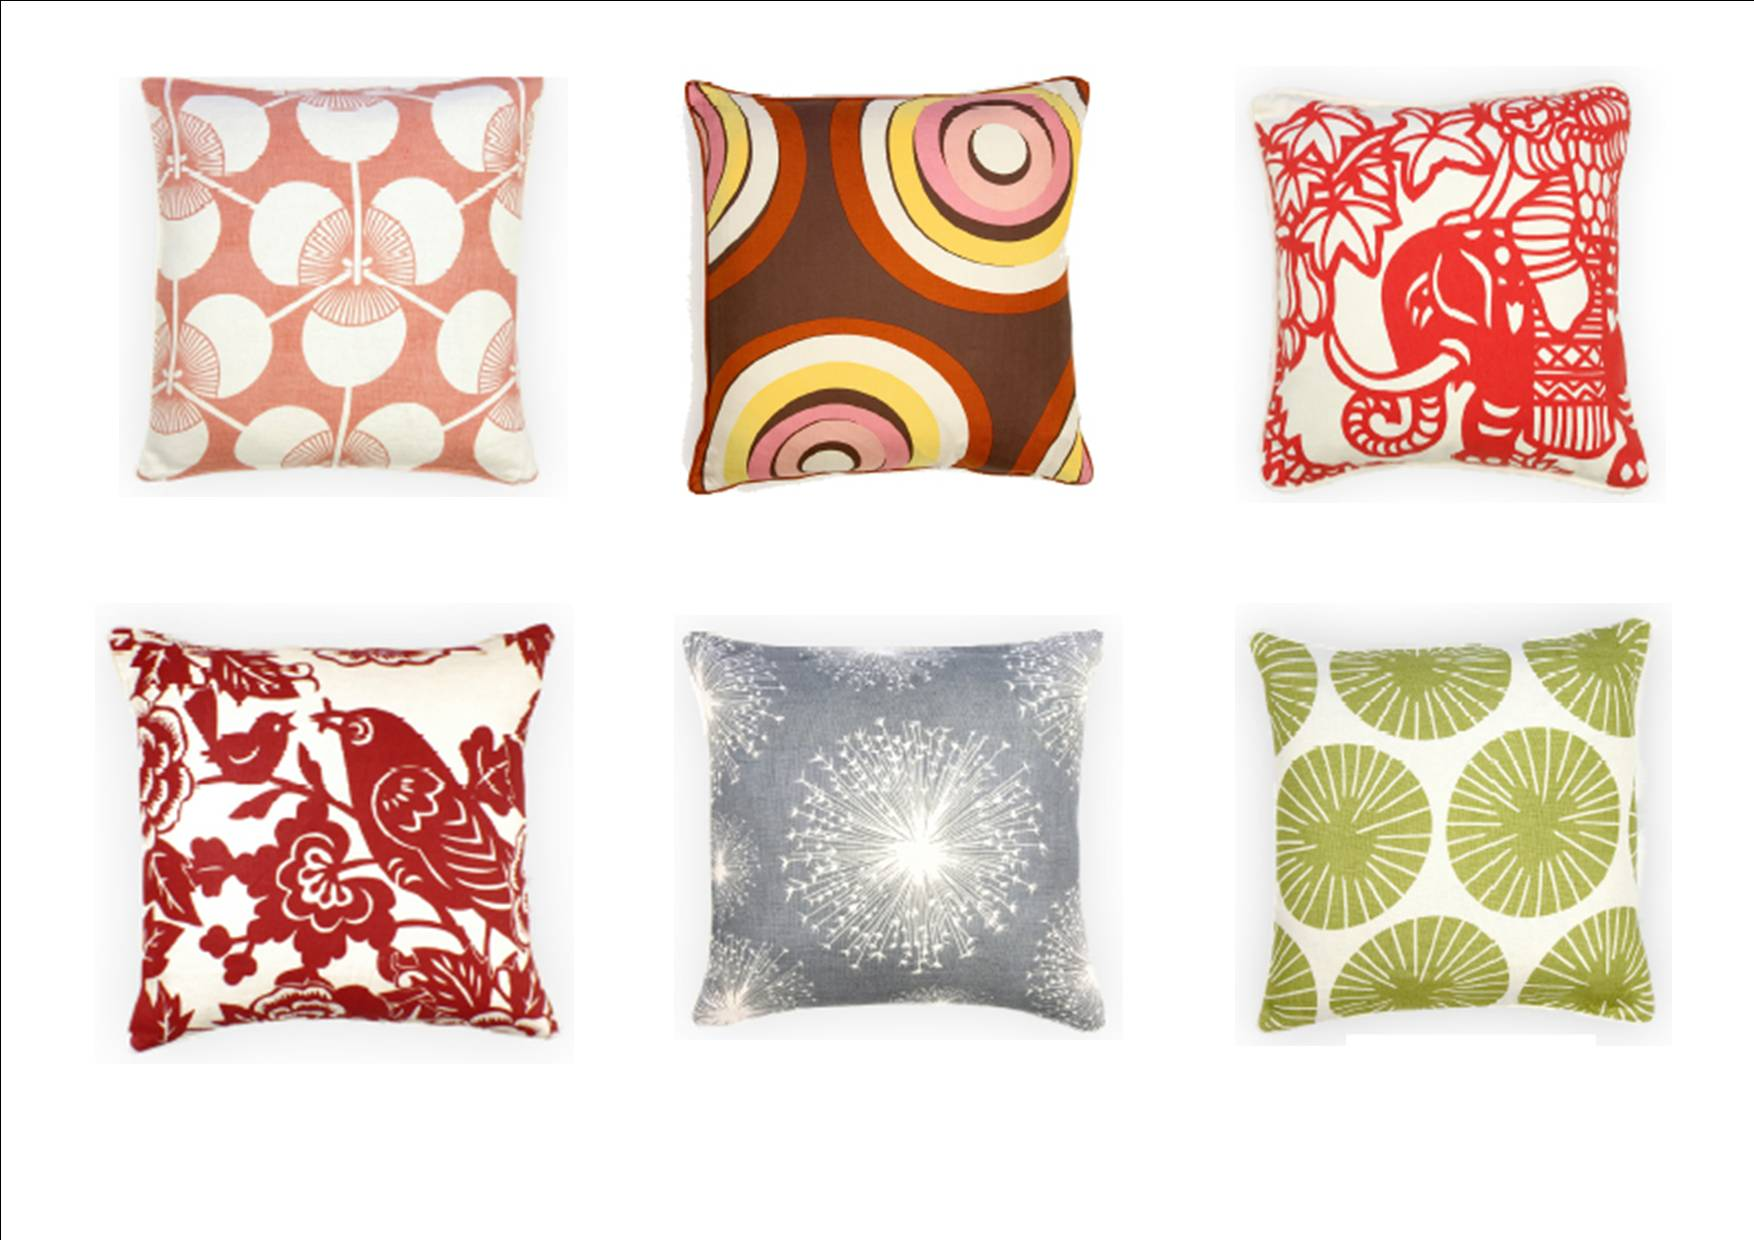 Pillows amp Cushions : cushions5 from agarwalfurnitures.com size 1754 x 1240 jpeg 167kB